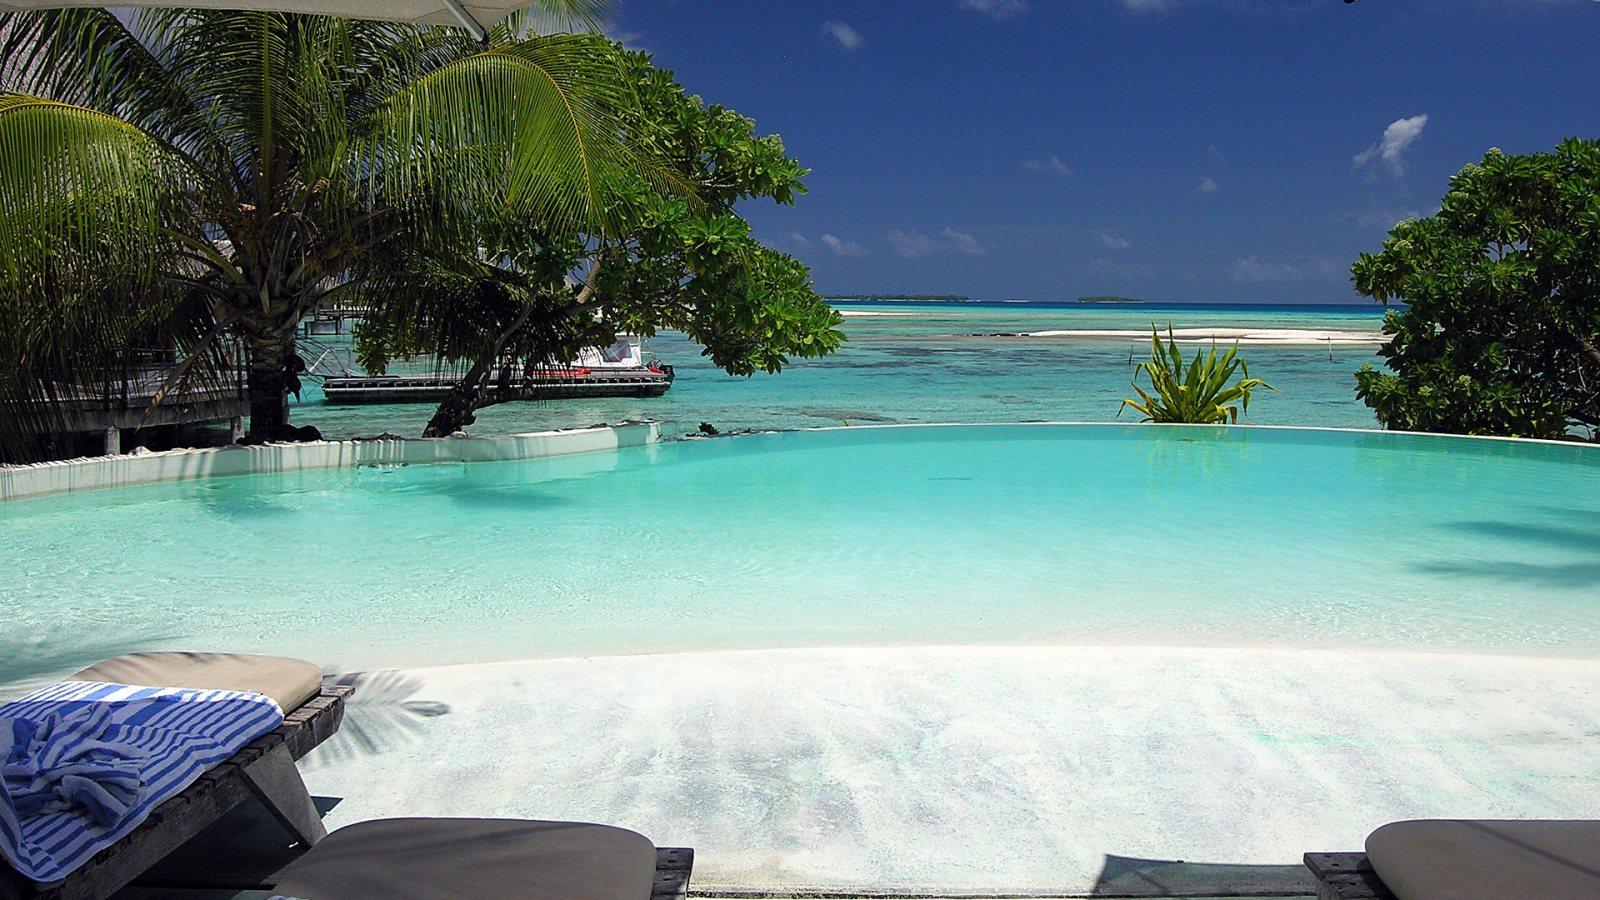 Tropical Paradises Pictures background your desktop photogallery 1600x900